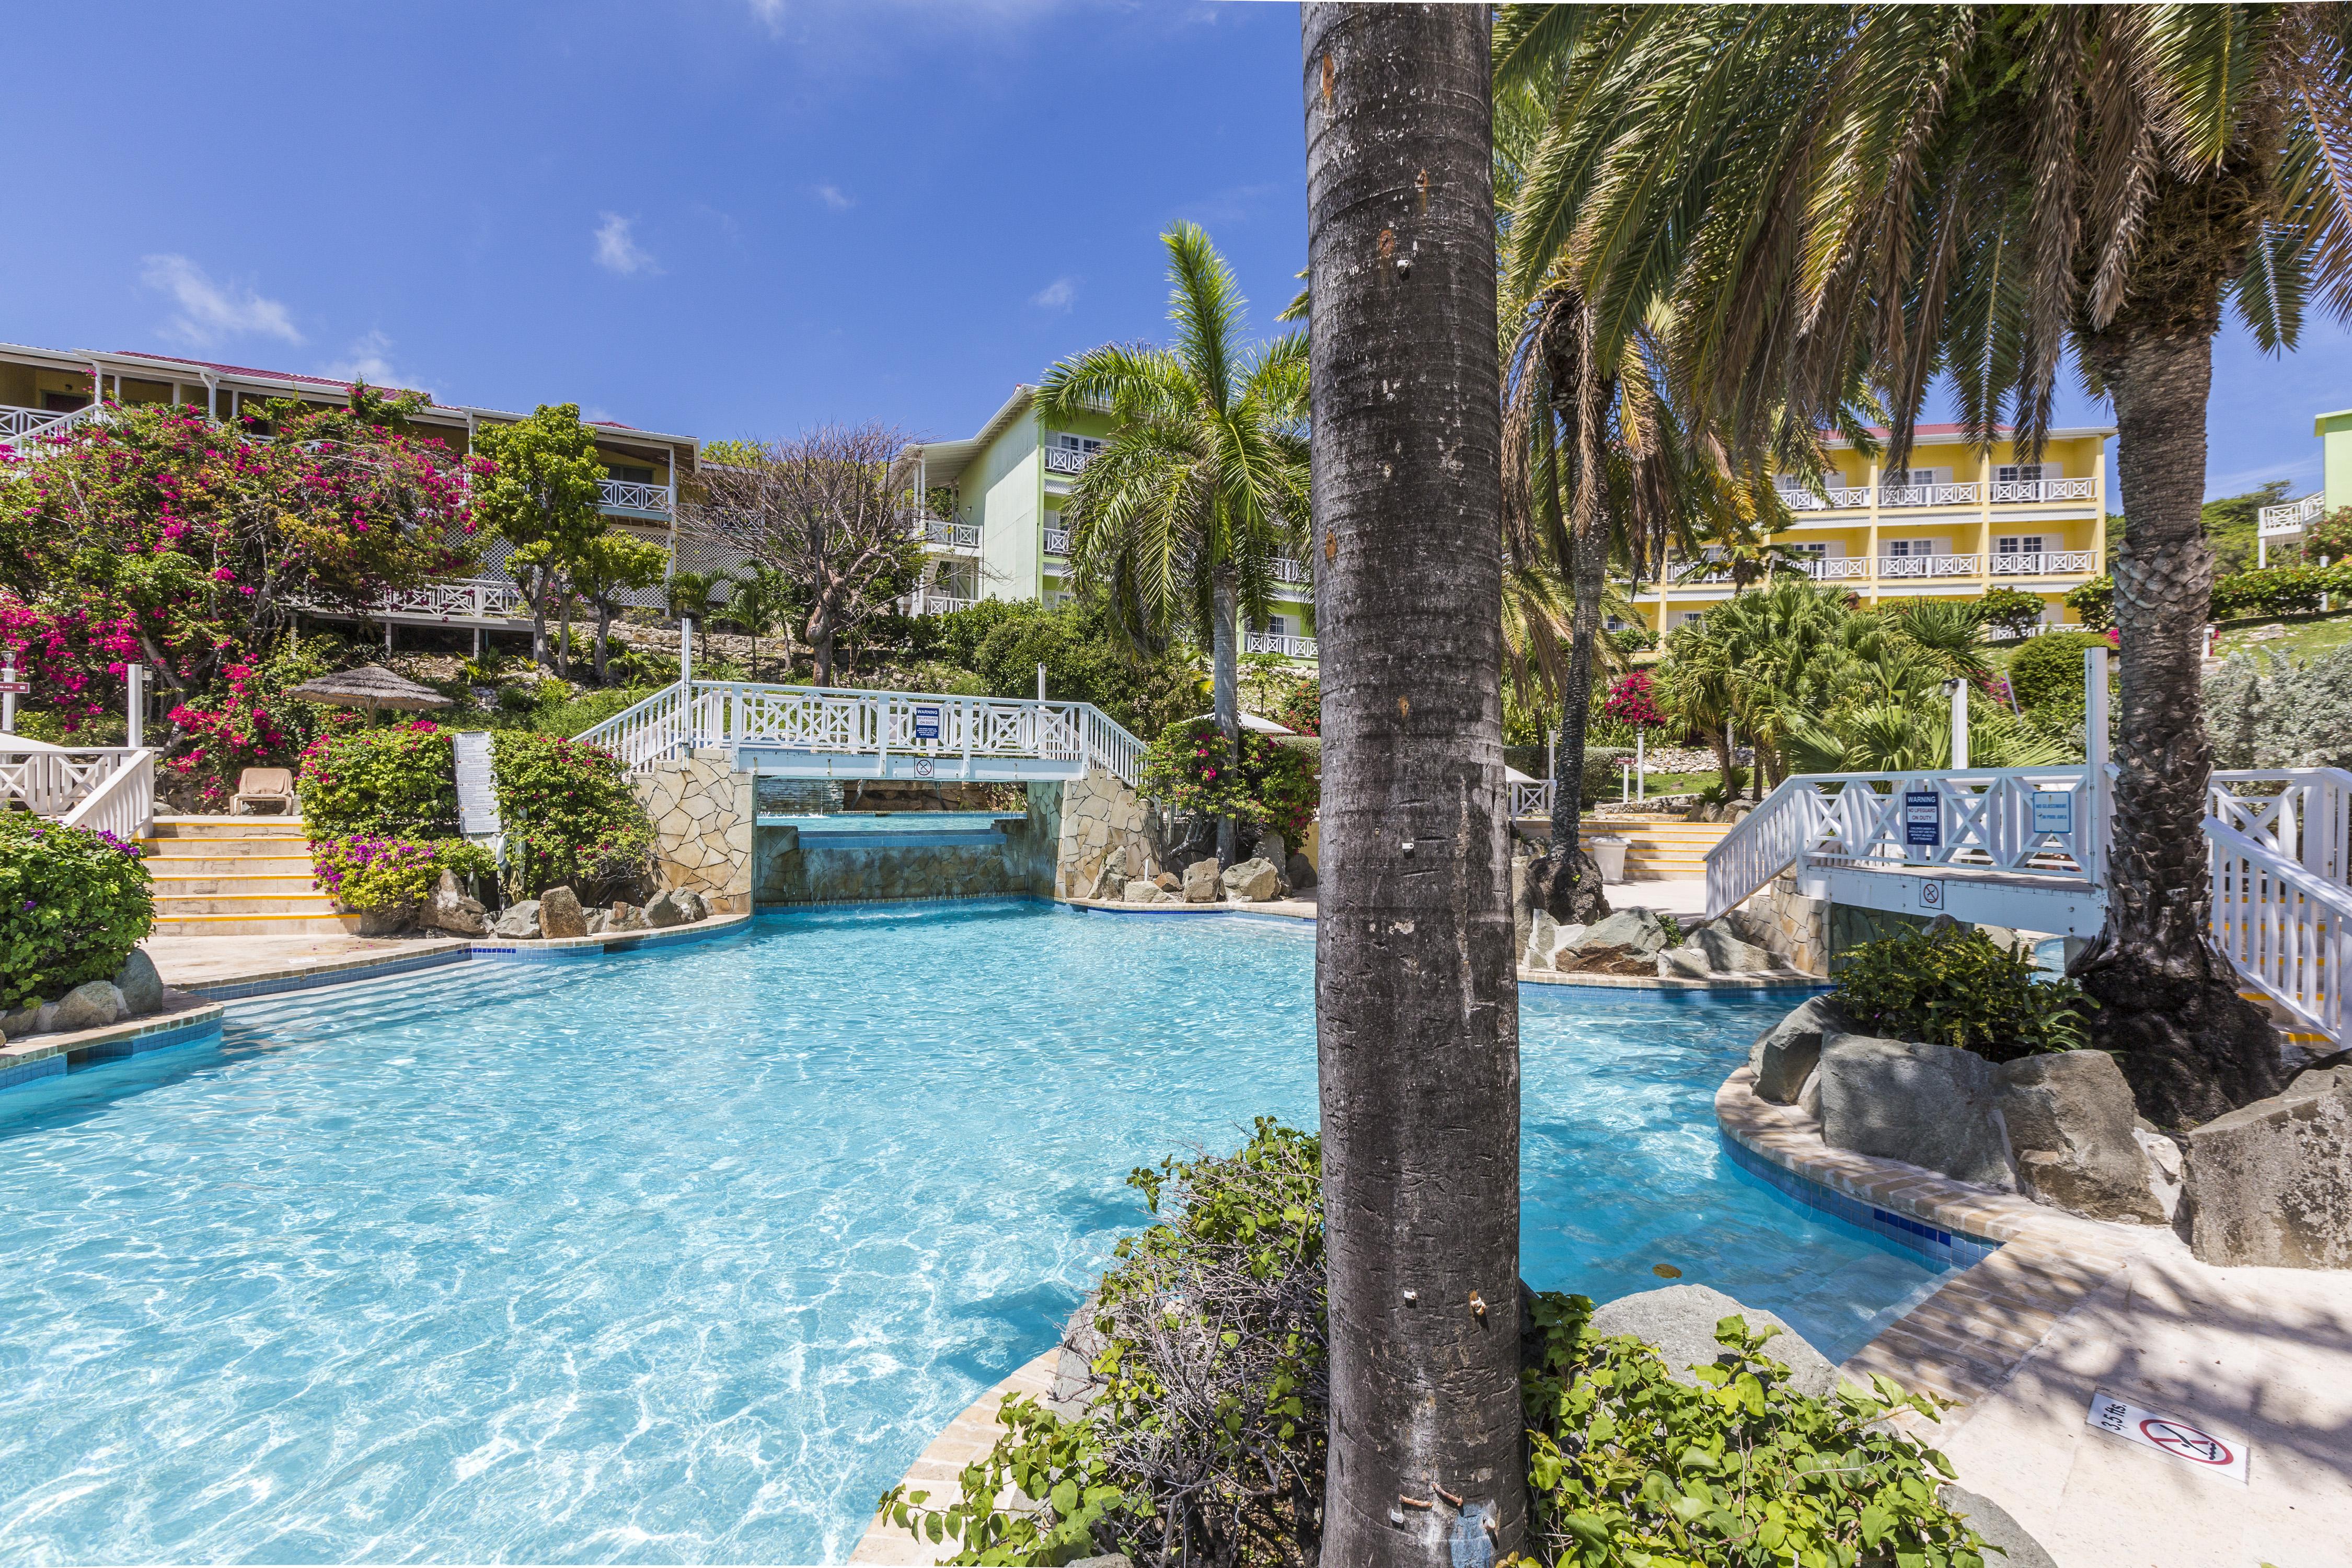 Pineapple Beach Club Resort